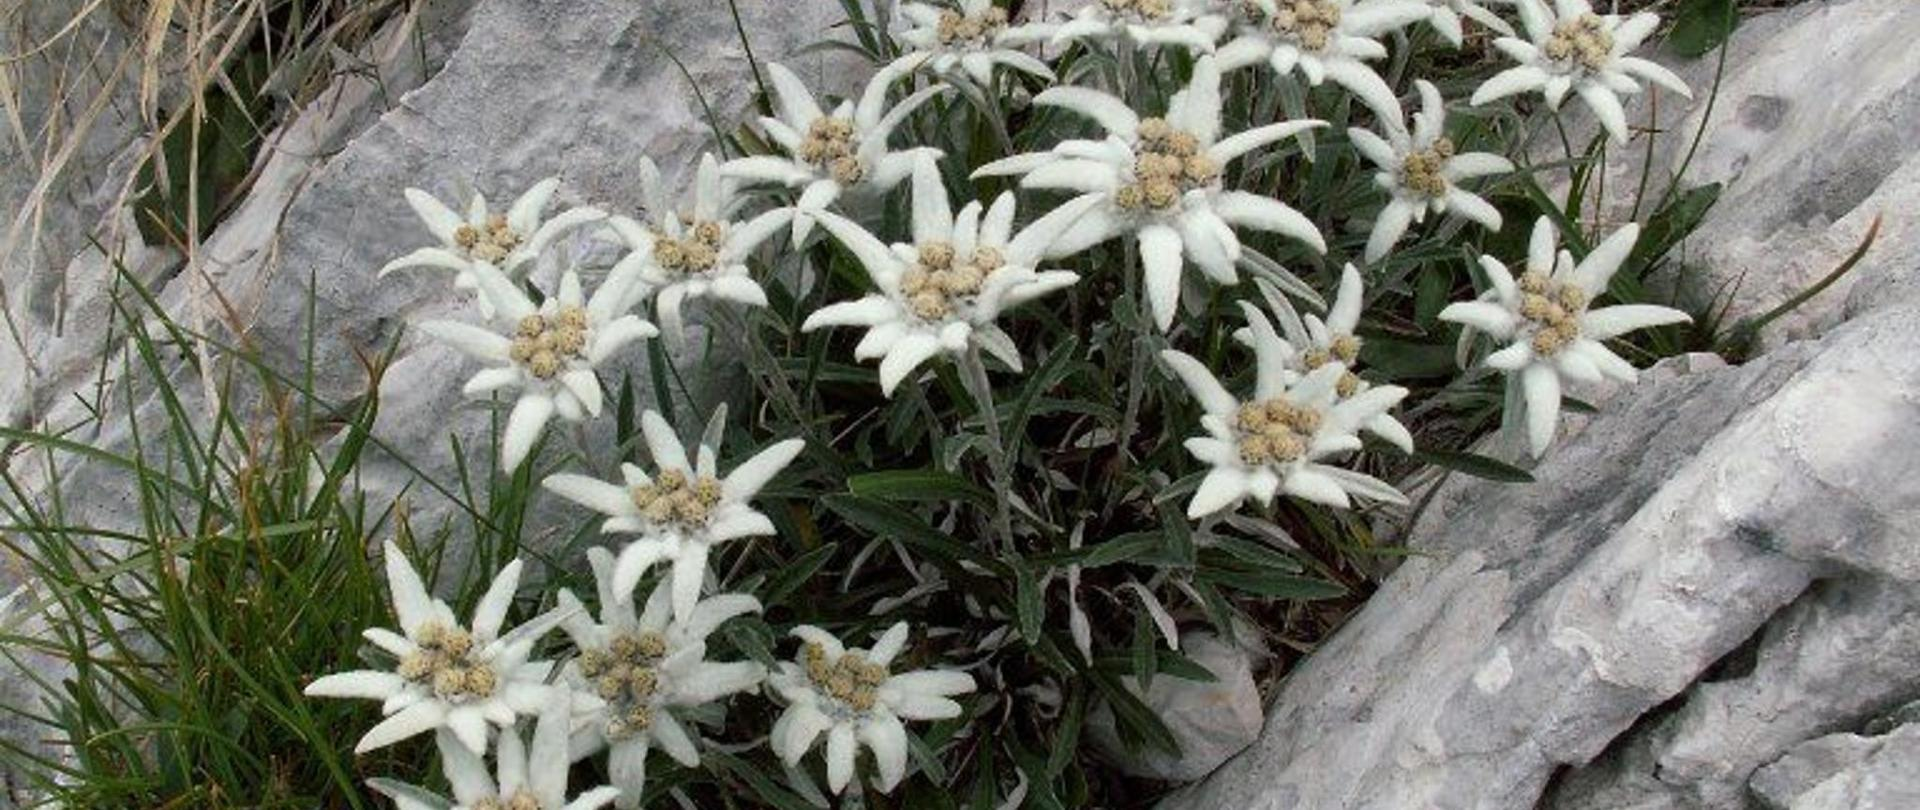 13-042-leontopodium-alpinum-stella-alpina.jpg